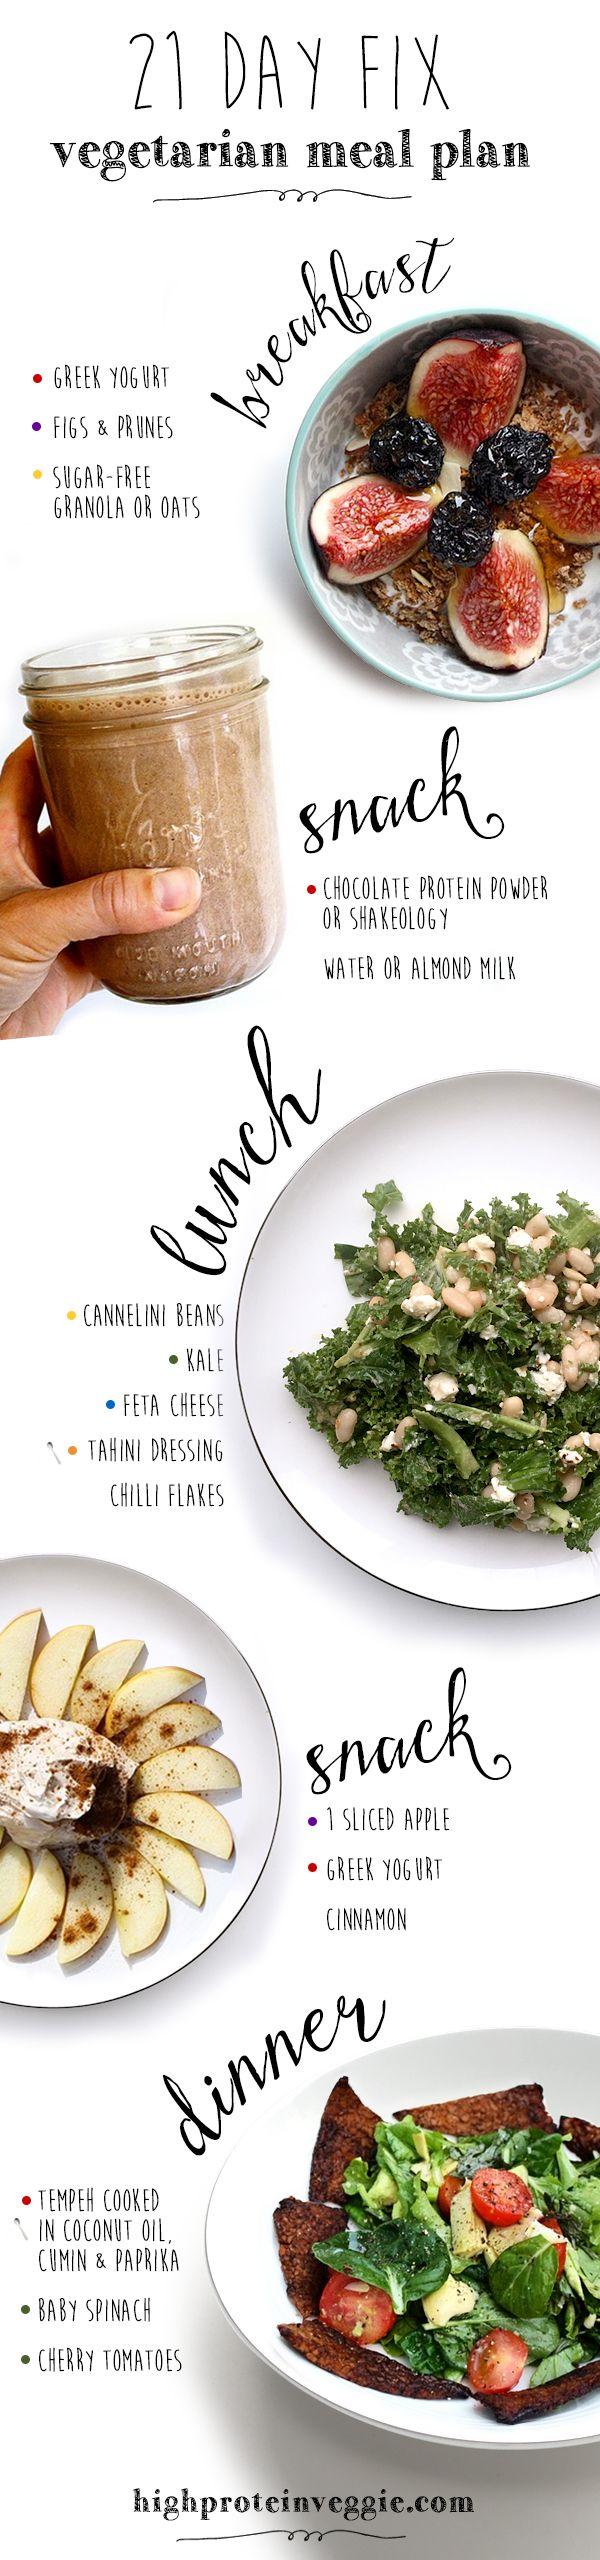 21 day fix vegetarian meal plan. Click to see more! #21dayfix #mealplan #vegetarian